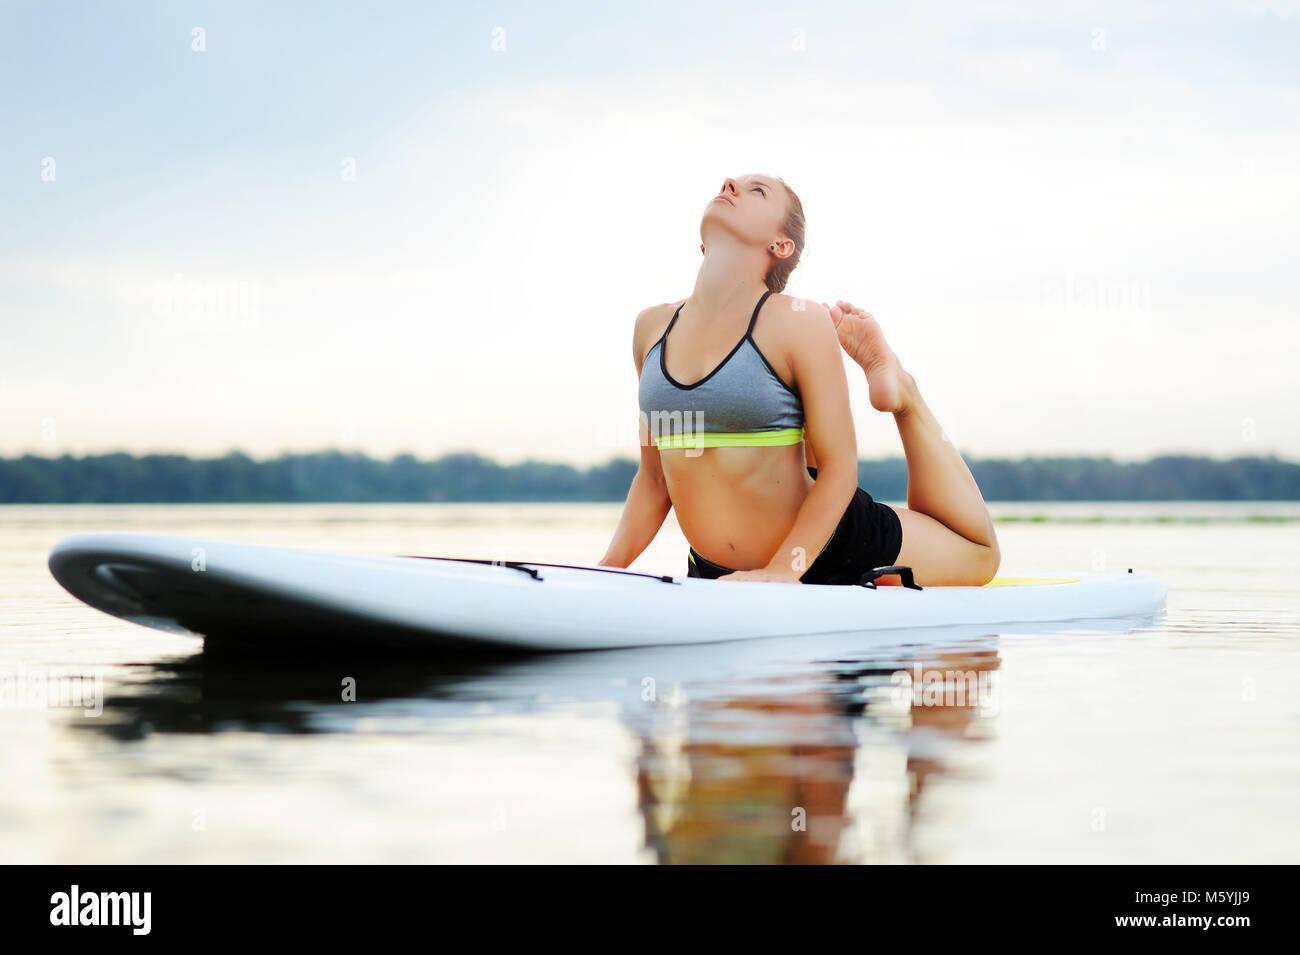 Woman on paddle board practicing snake yoga pose - Stock Image